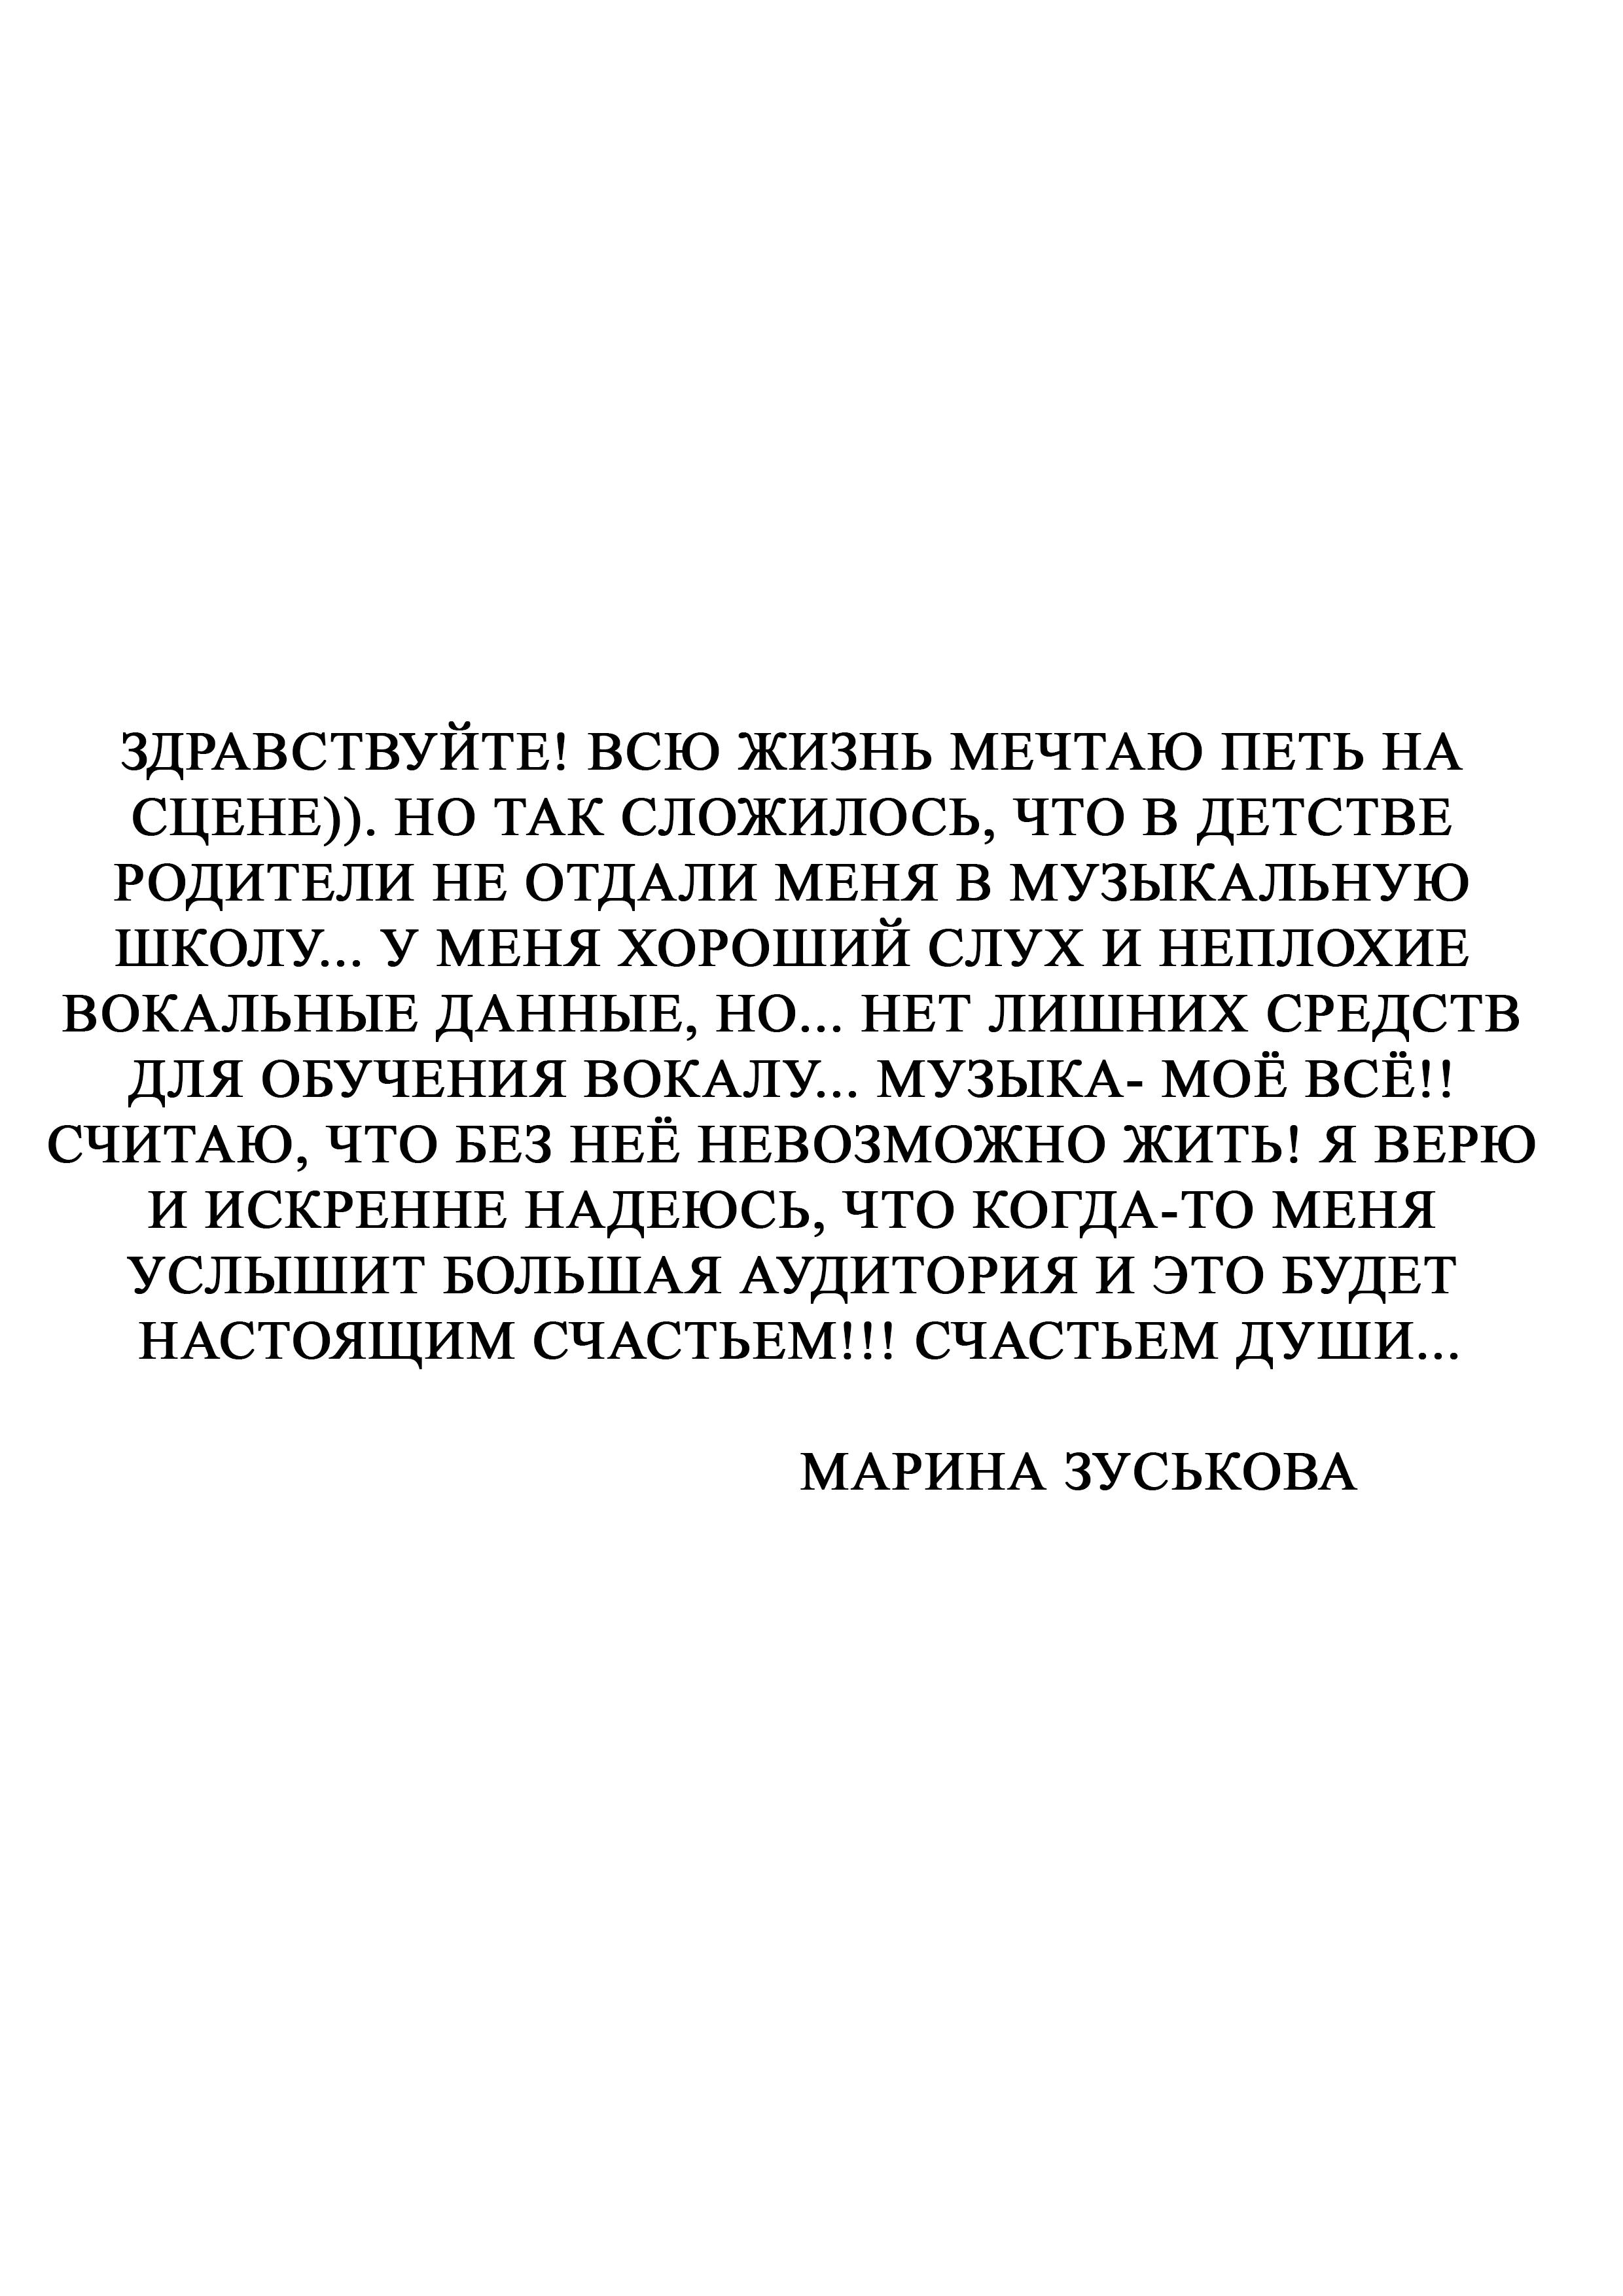 Марина Зуськова